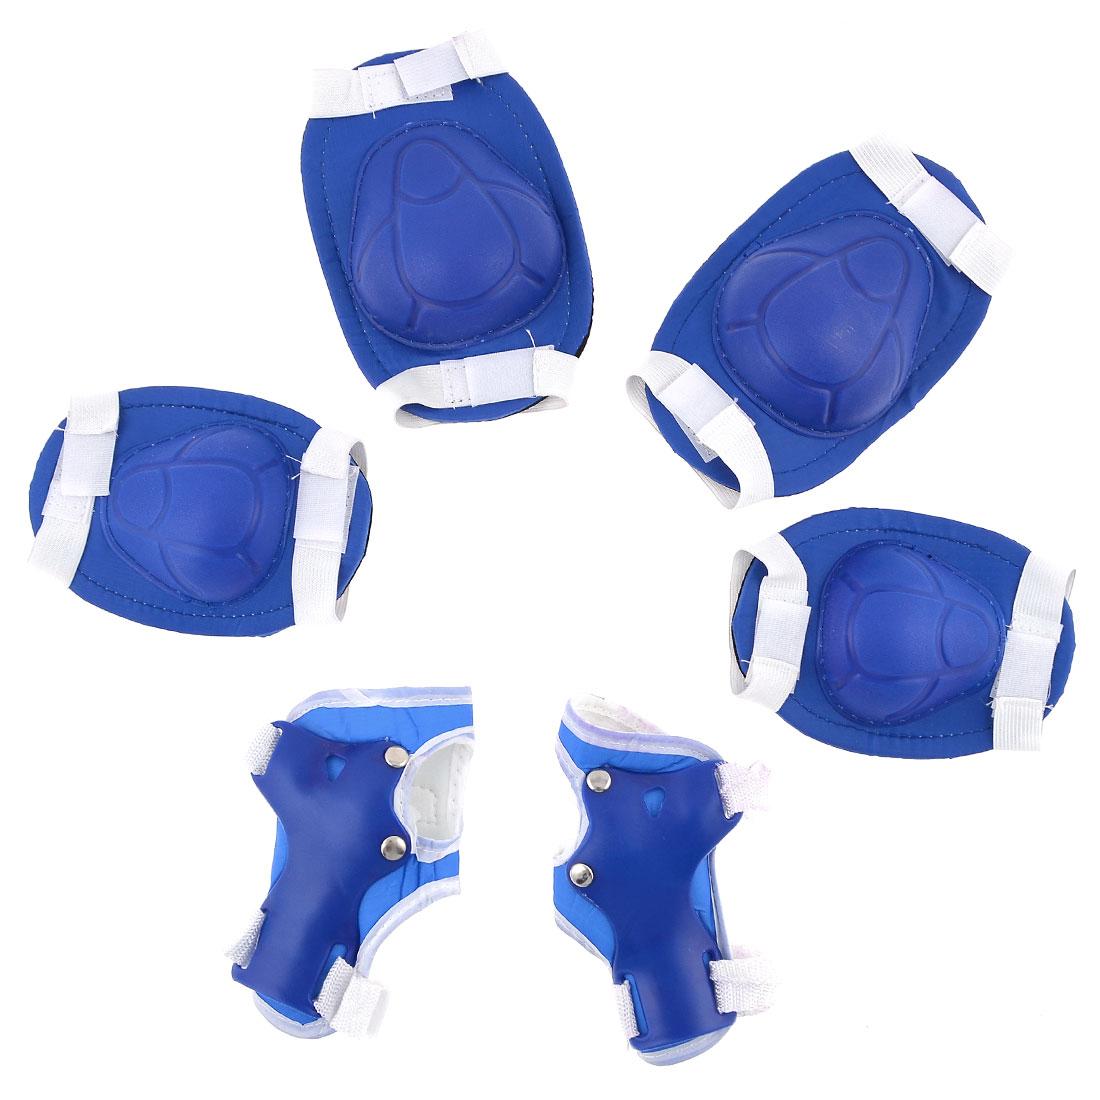 Child Adjustable Hook Loop Fastener Knee Elbow Palm Support Set Blue White